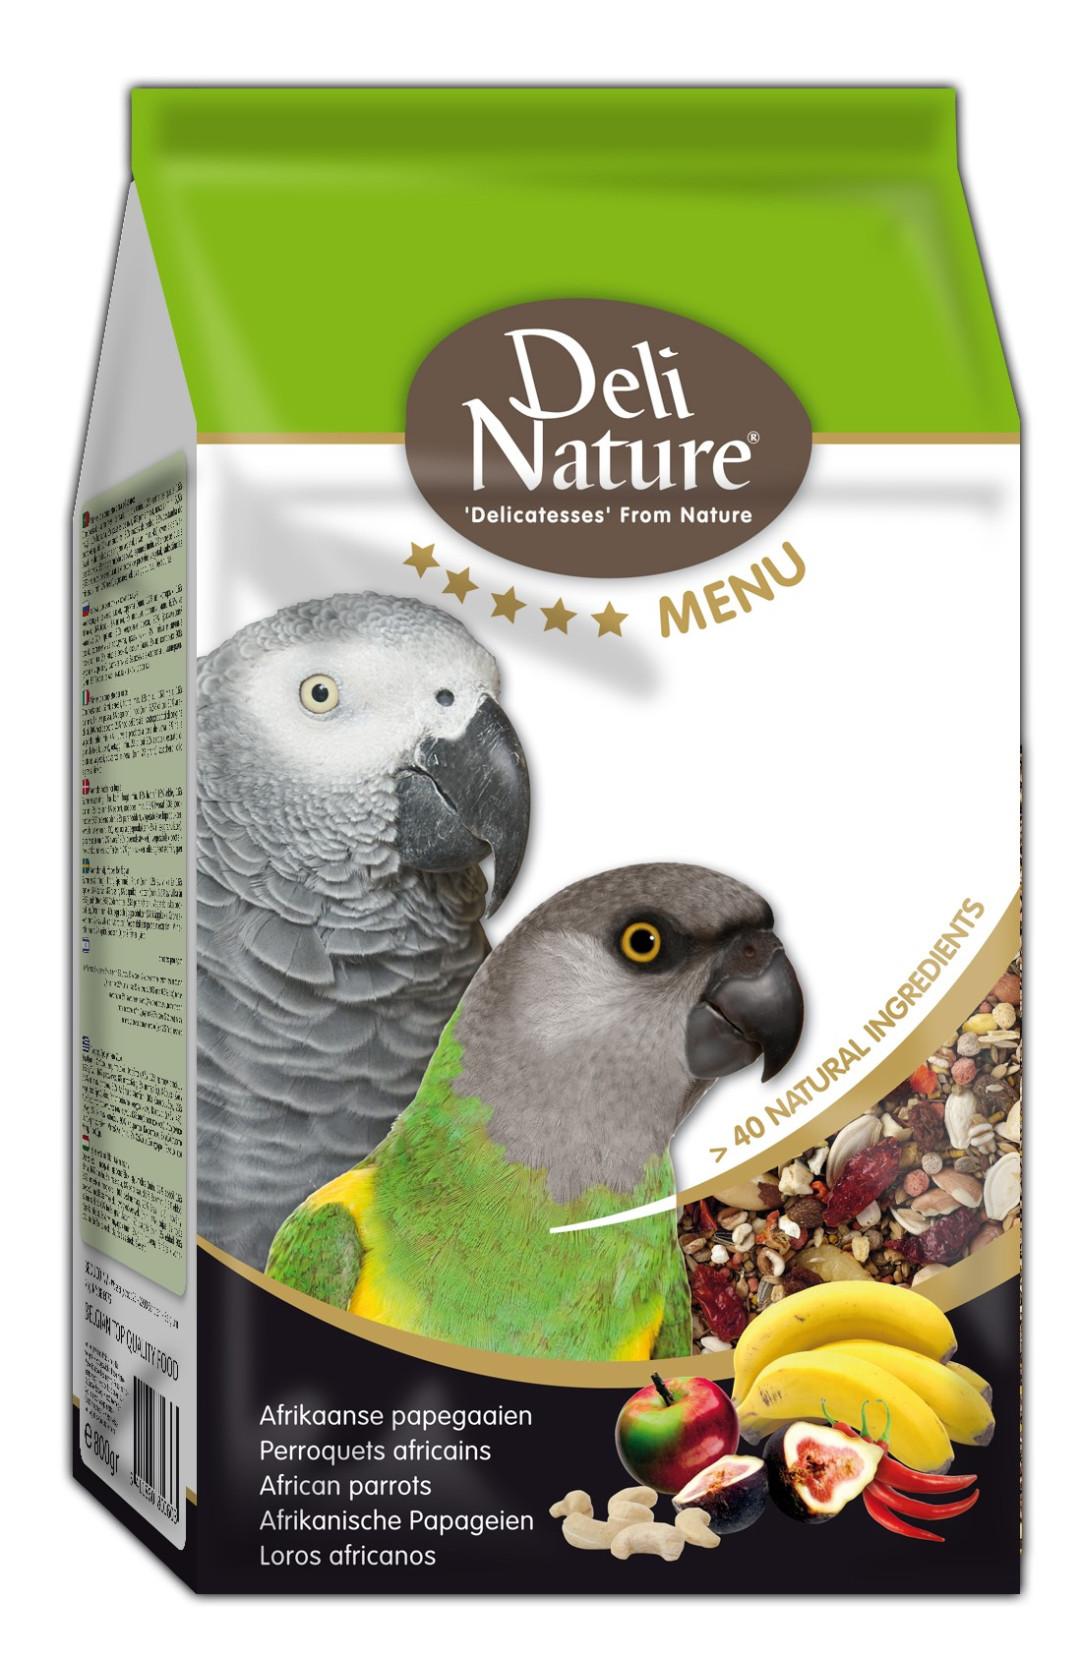 Deli Nature vijf sterren menu Afrikaanse Papegaai 800 gr